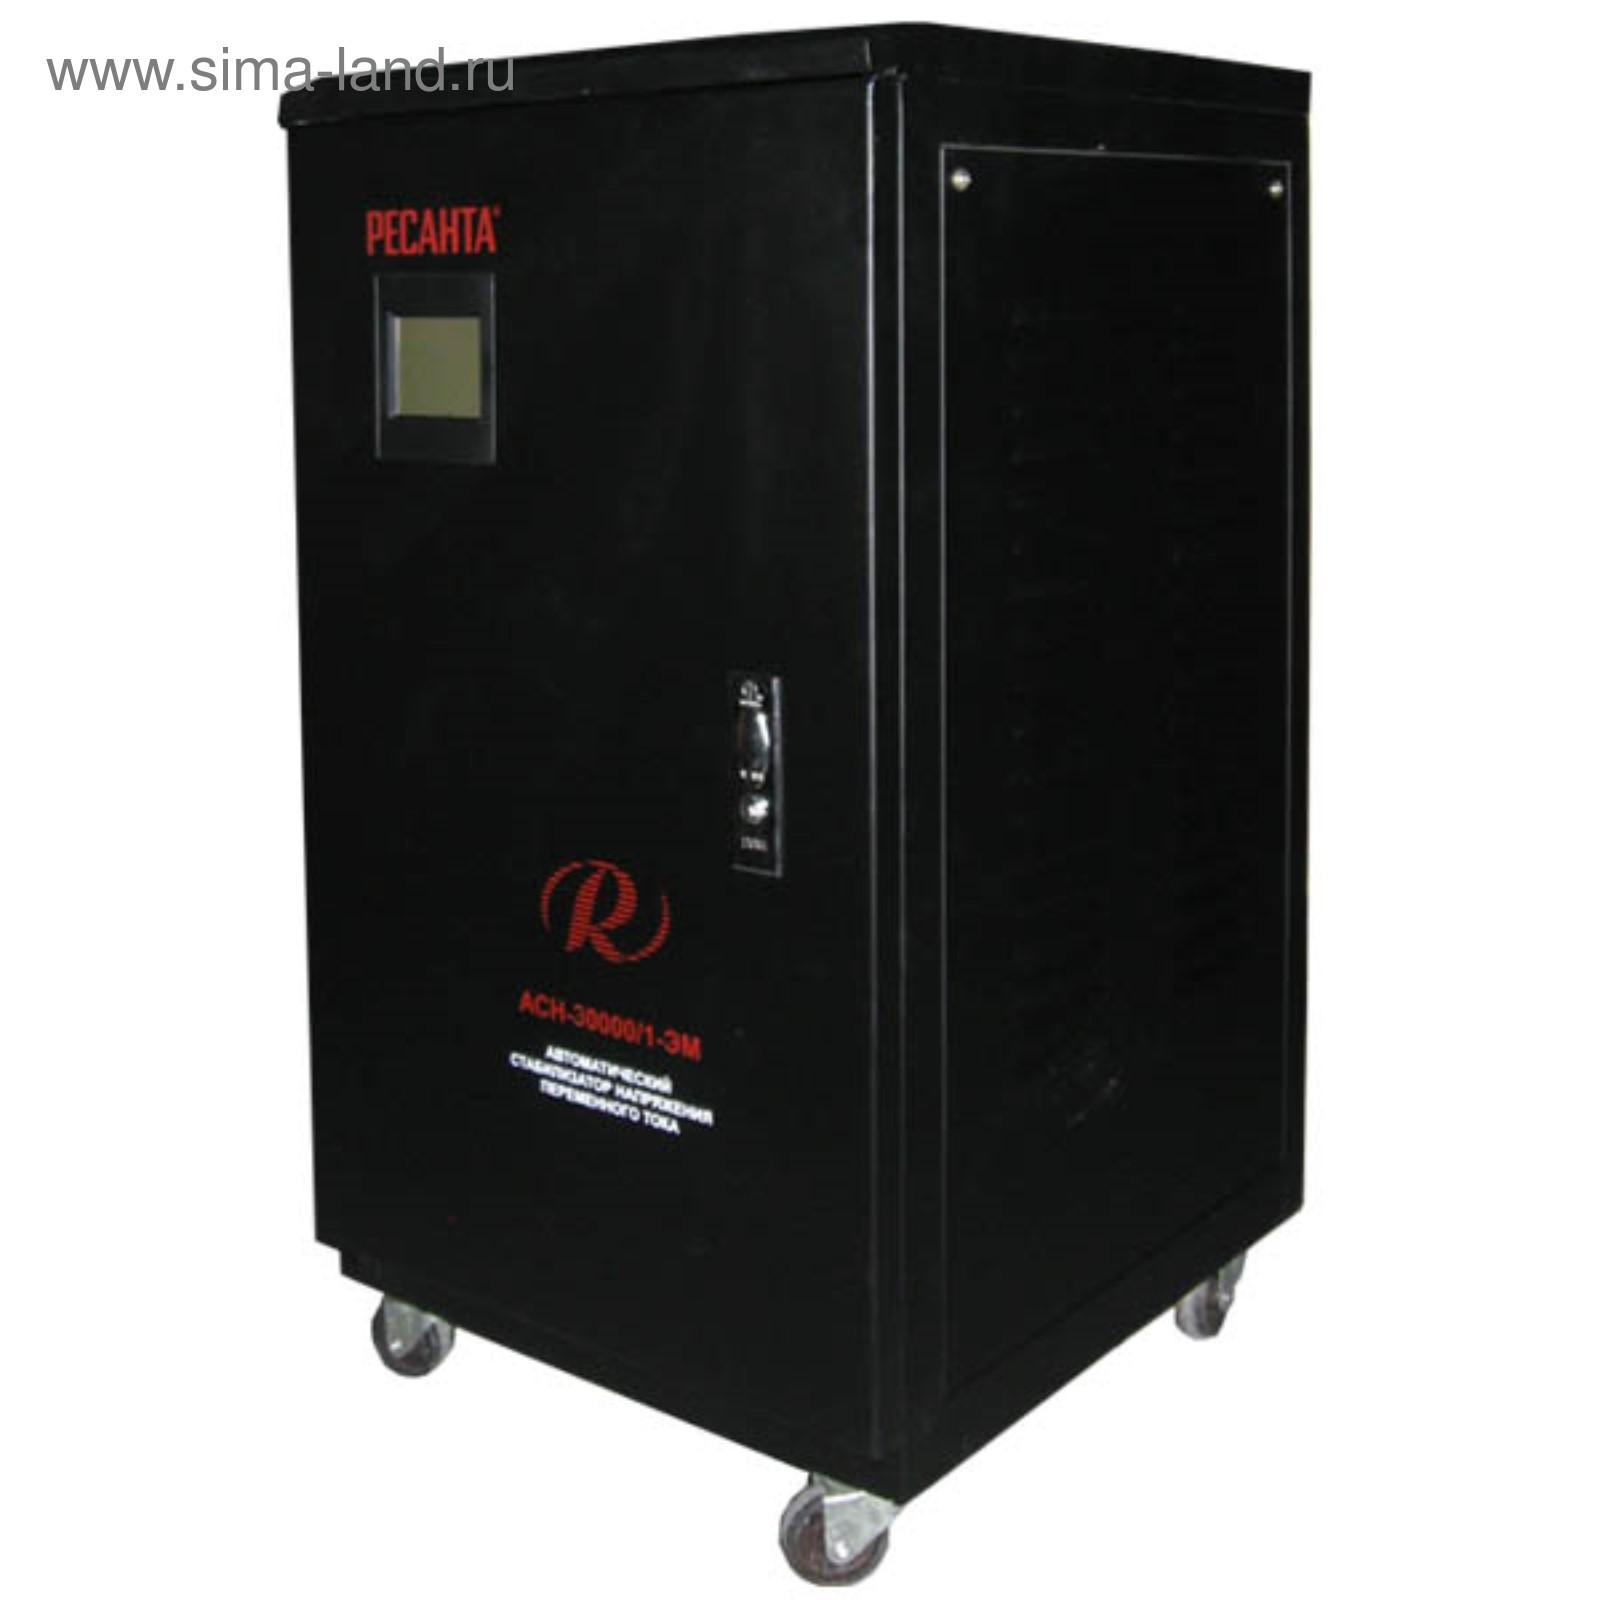 Стабилизатор напряжения на 30000 комплектующие стабилизаторов напряжения